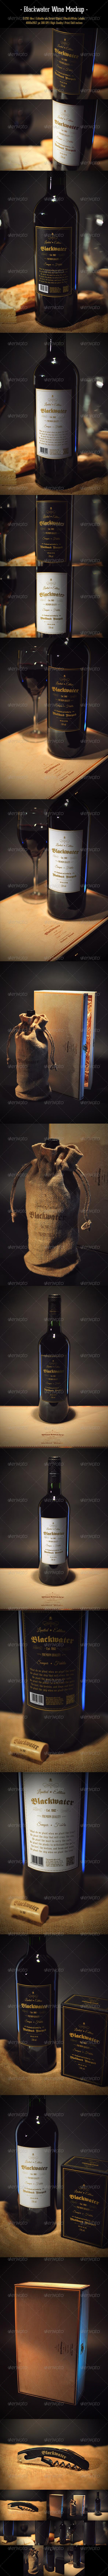 GraphicRiver Blackwater Wine Mockup 6404791